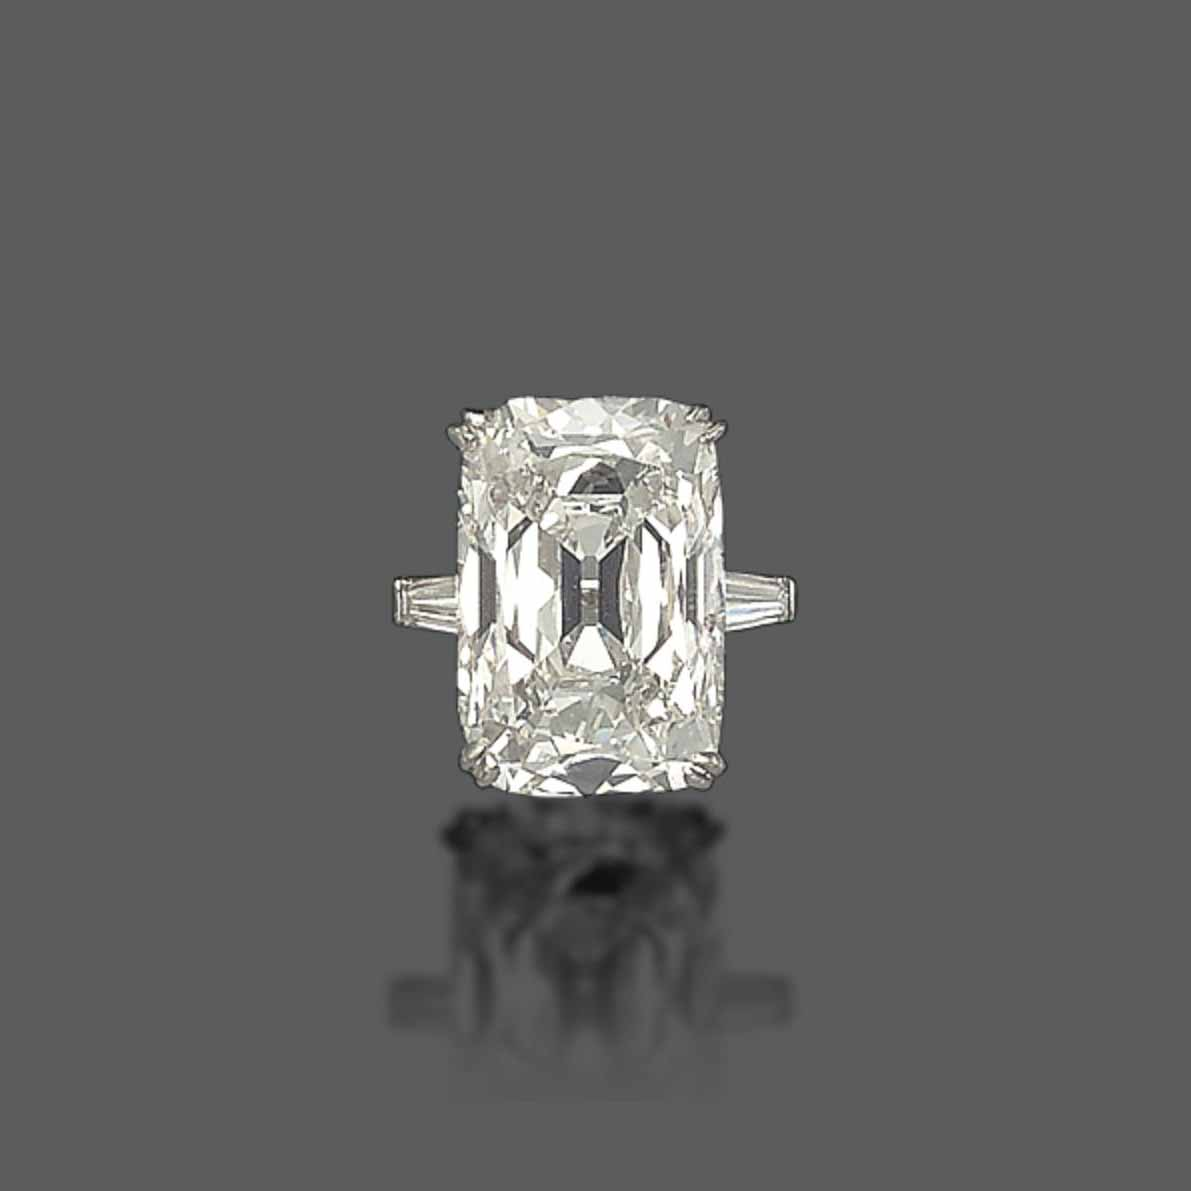 AN ELEGANT DIAMOND RING, BY CUSI